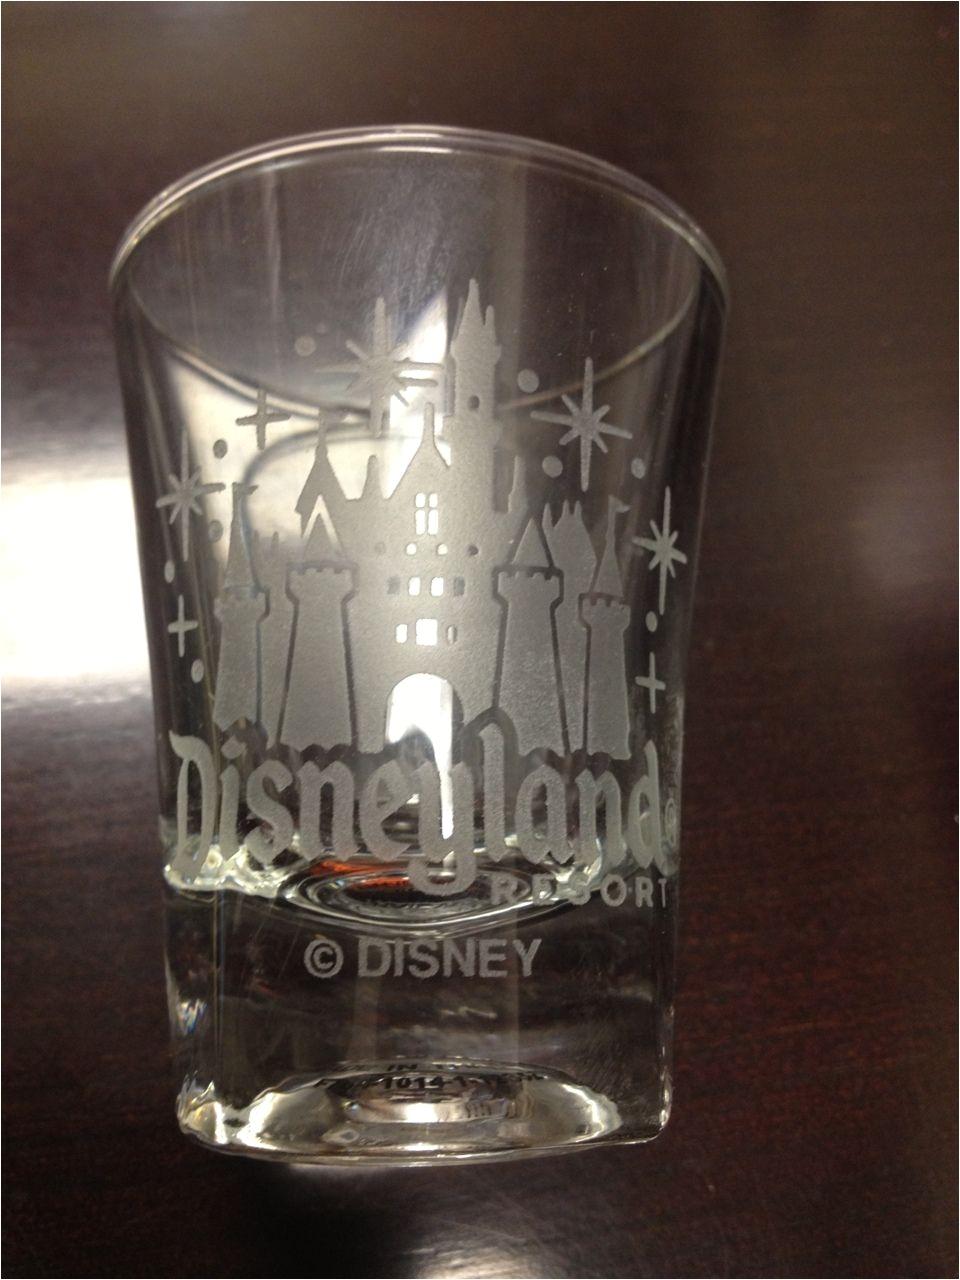 Where to Buy Decorative Shot Glasses Disneyland orlando Florida Shot Glasses Pinterest Shot